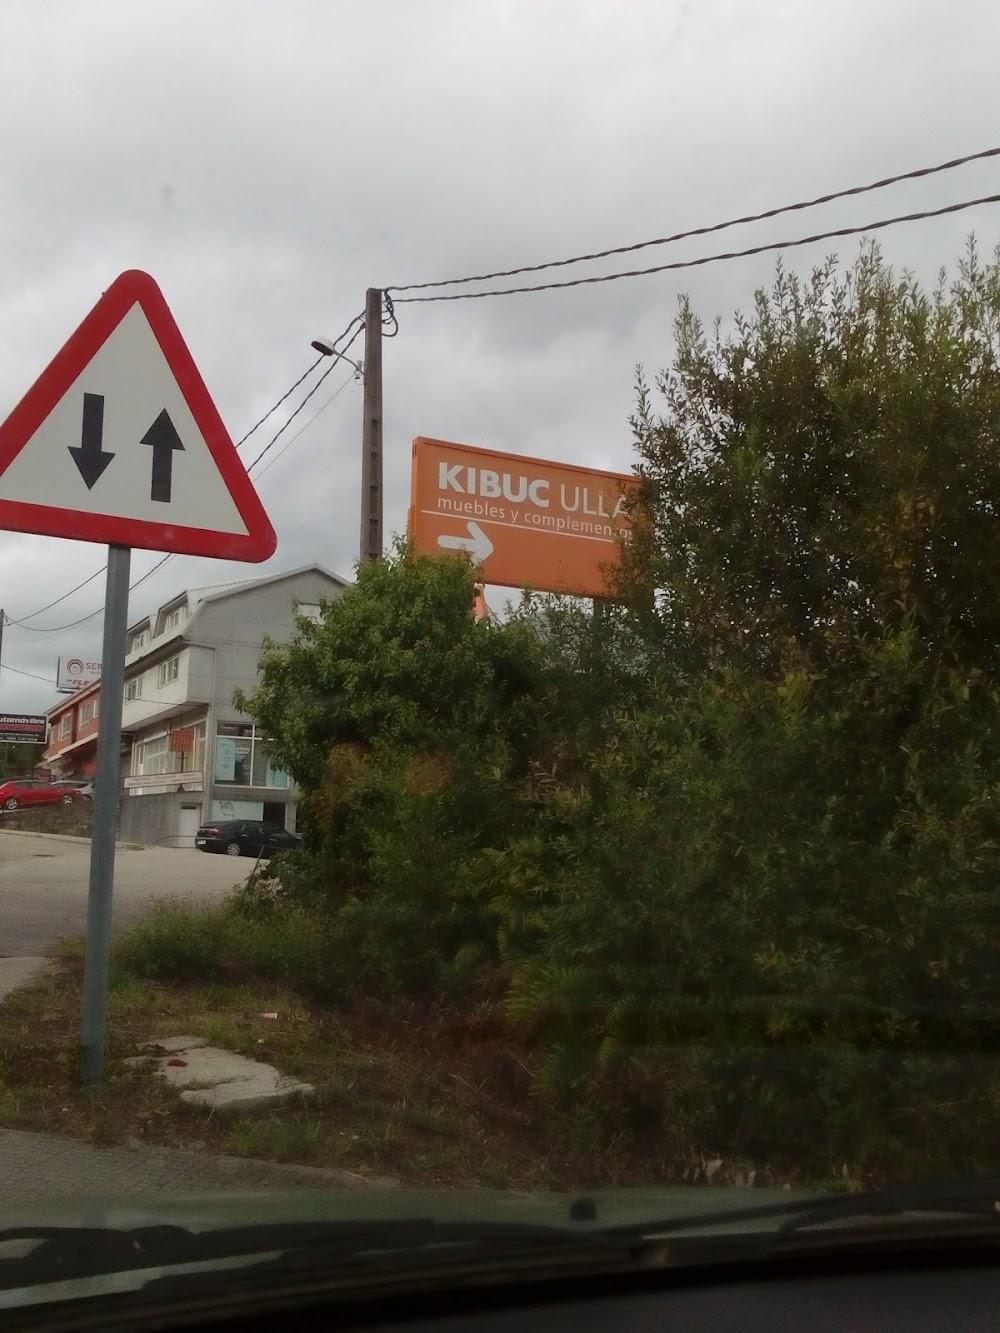 Kibuc Ulla Vg 20 36416 Tameiga Mos Pontevedra Espa A # Muebles Kibuc Ulla Vigo